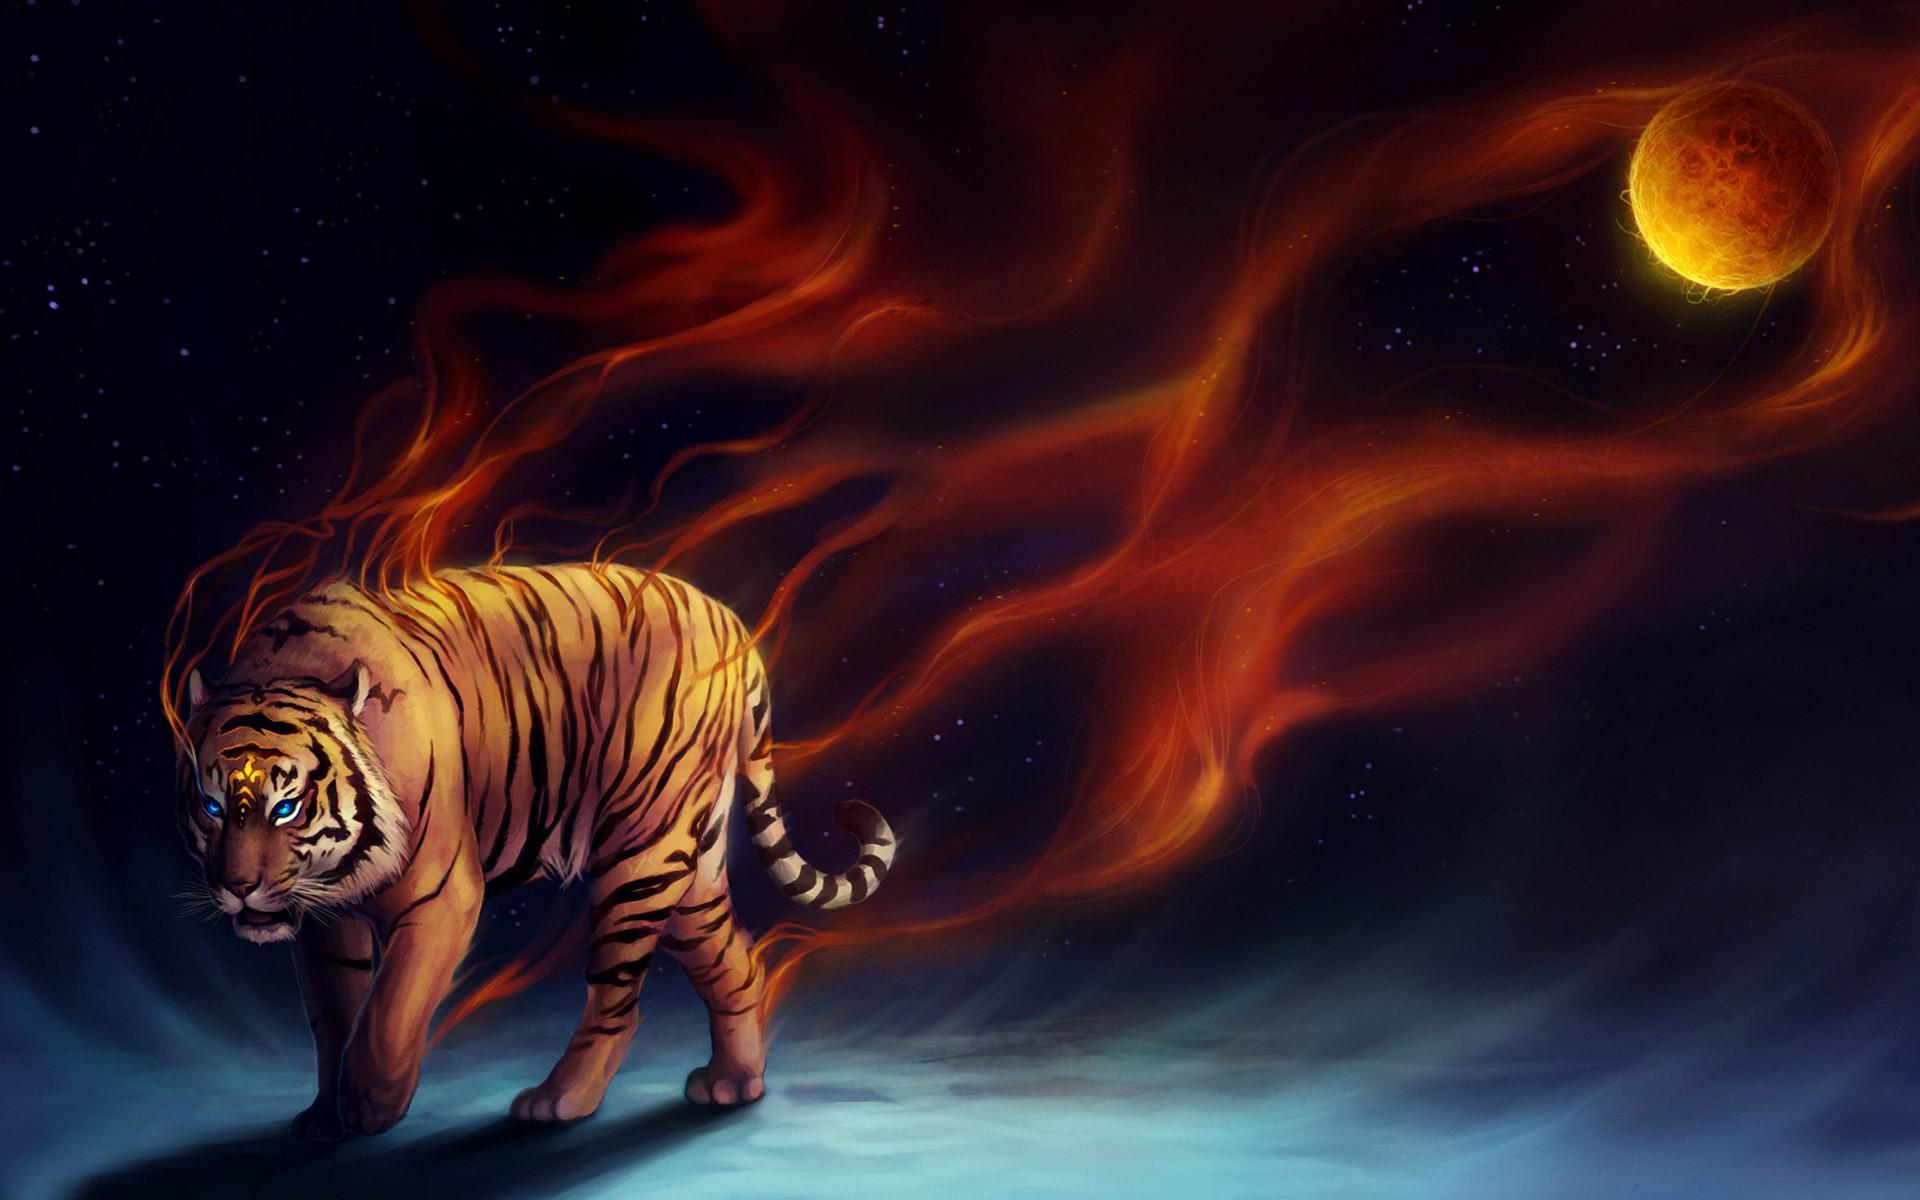 Fantasy Tiger Hd Desktop Wallpapers Widescreen High: Cool Tiger Wallpapers ·① WallpaperTag